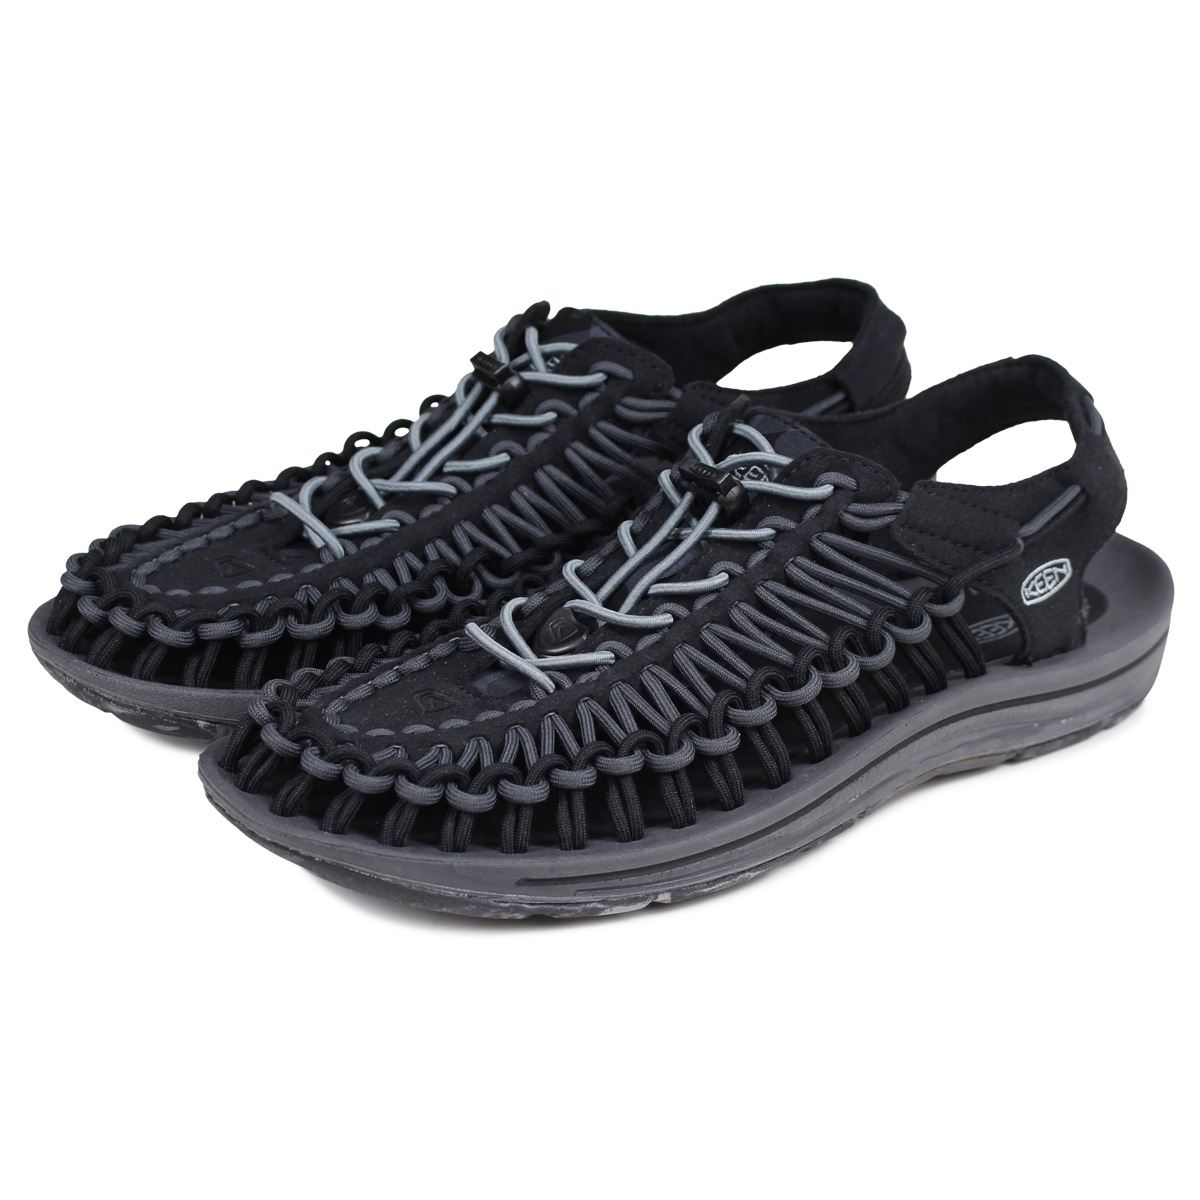 KEEN UNEEK キーン ユニーク サンダル スポーツサンダル メンズ ブラック 黒 1020778